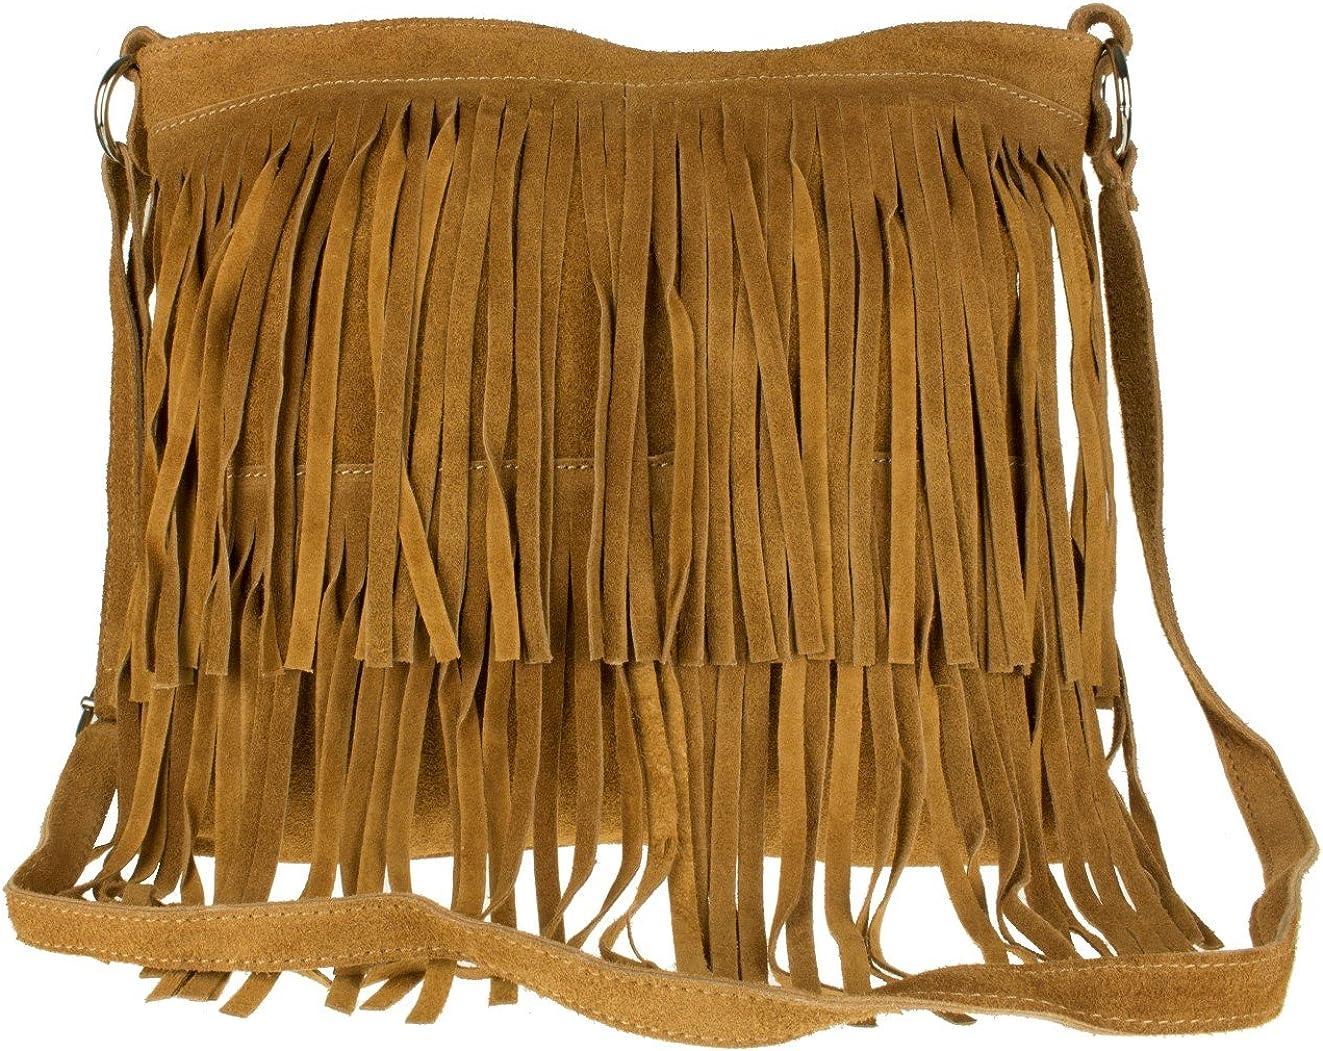 Girly Handbags Suede Fringe...